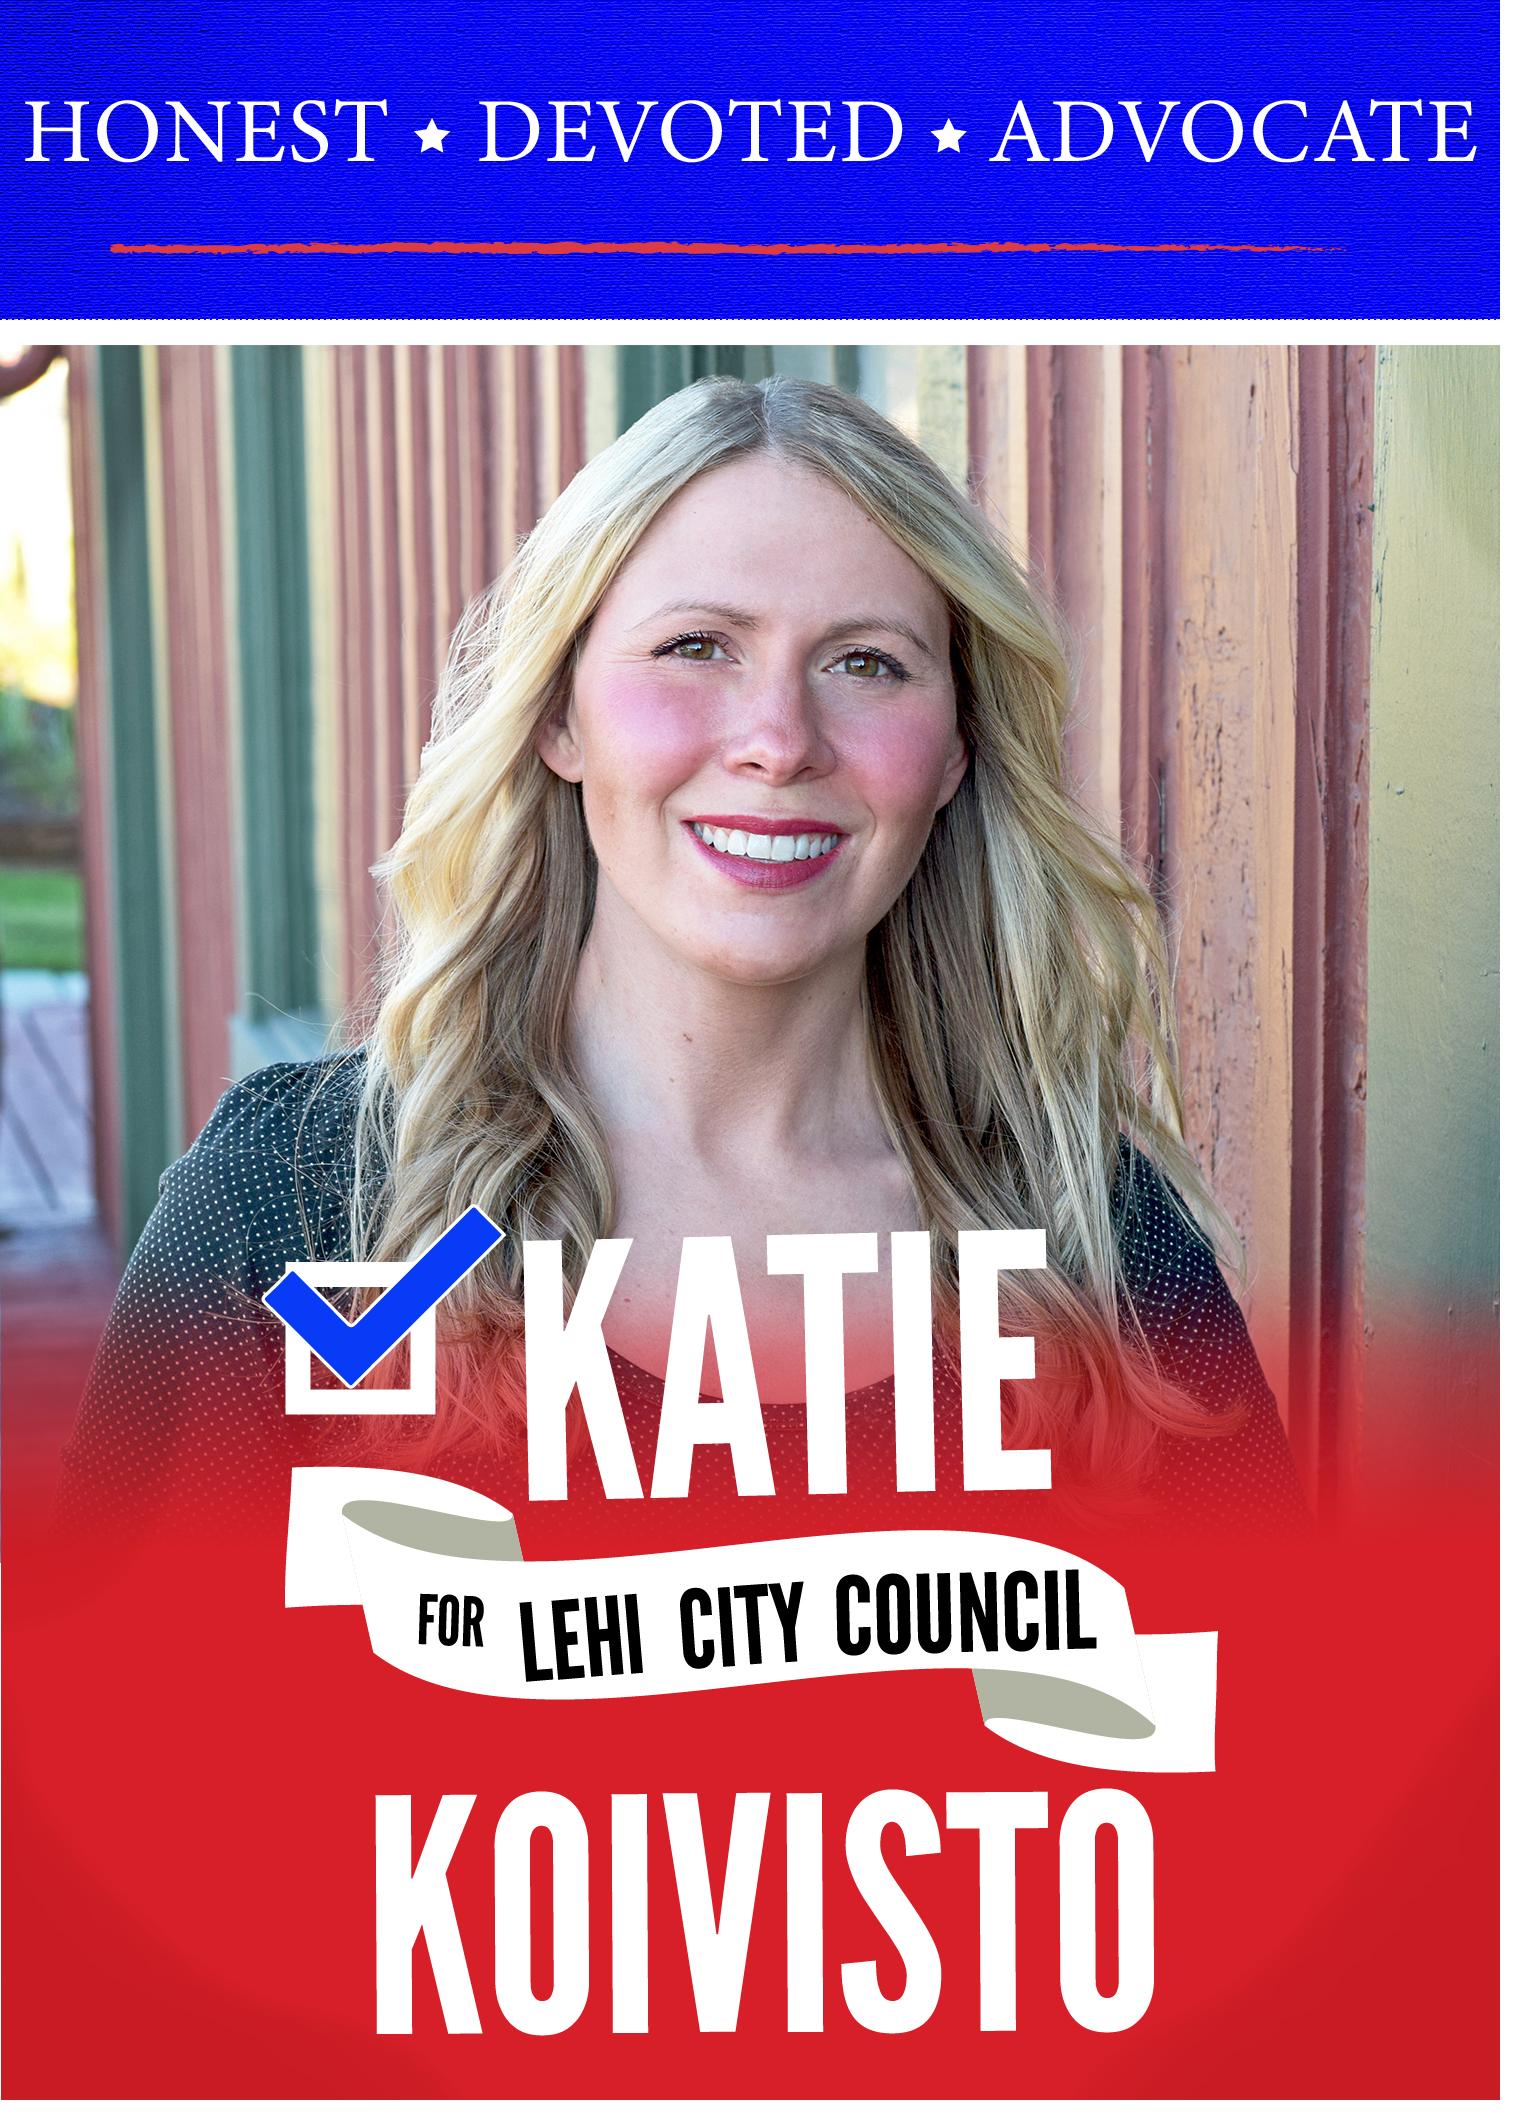 Katie Koivisto 101719 eight page